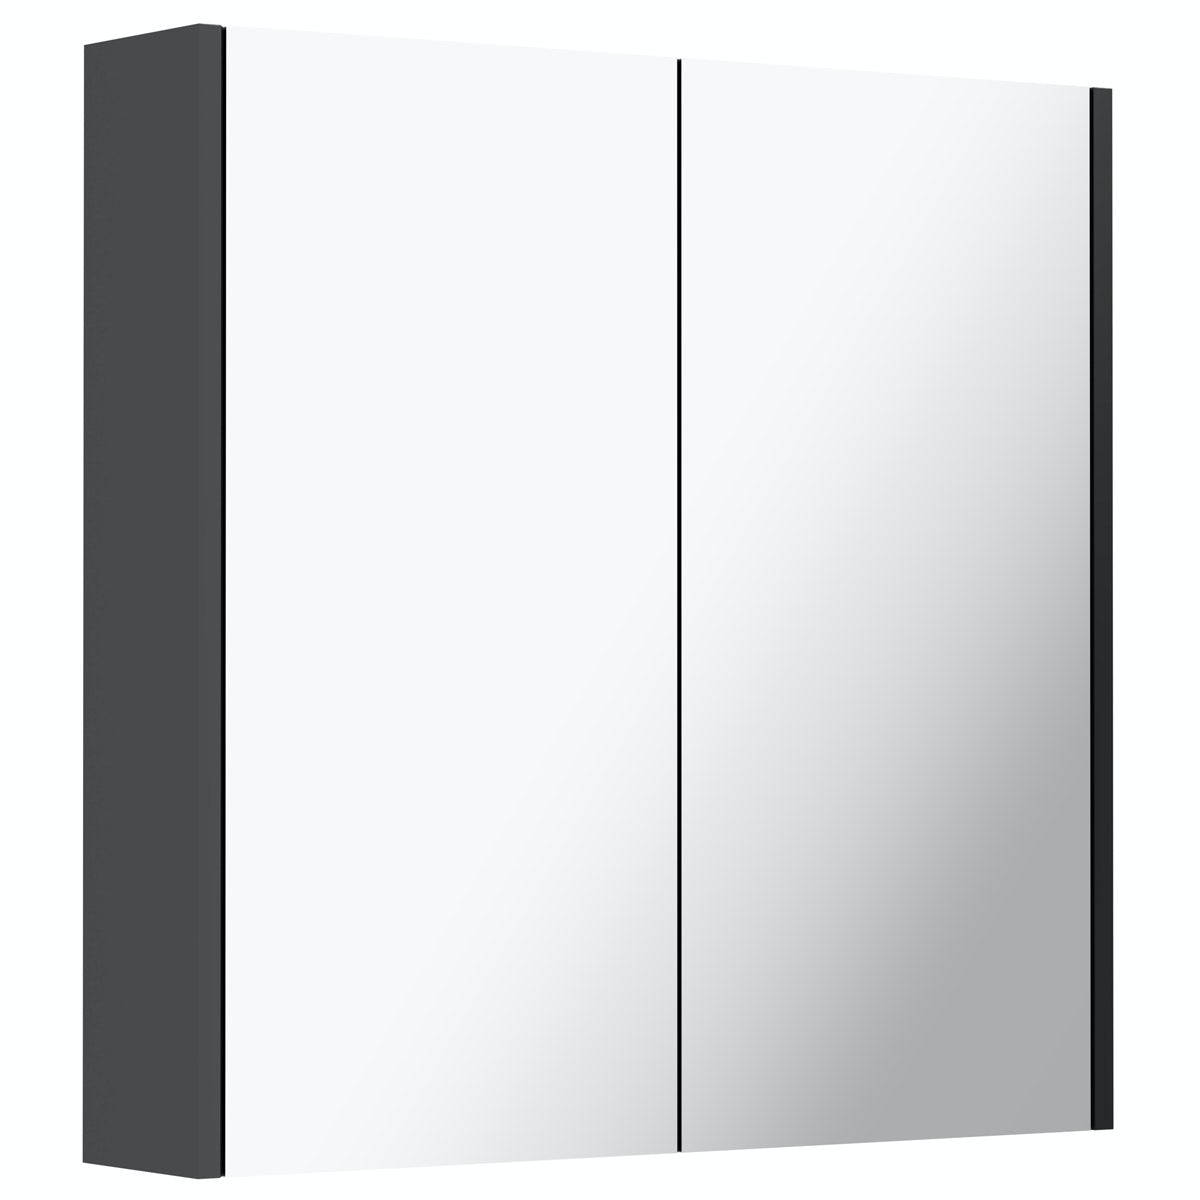 Mode Cooper anthracite mirror cabinet 650mm